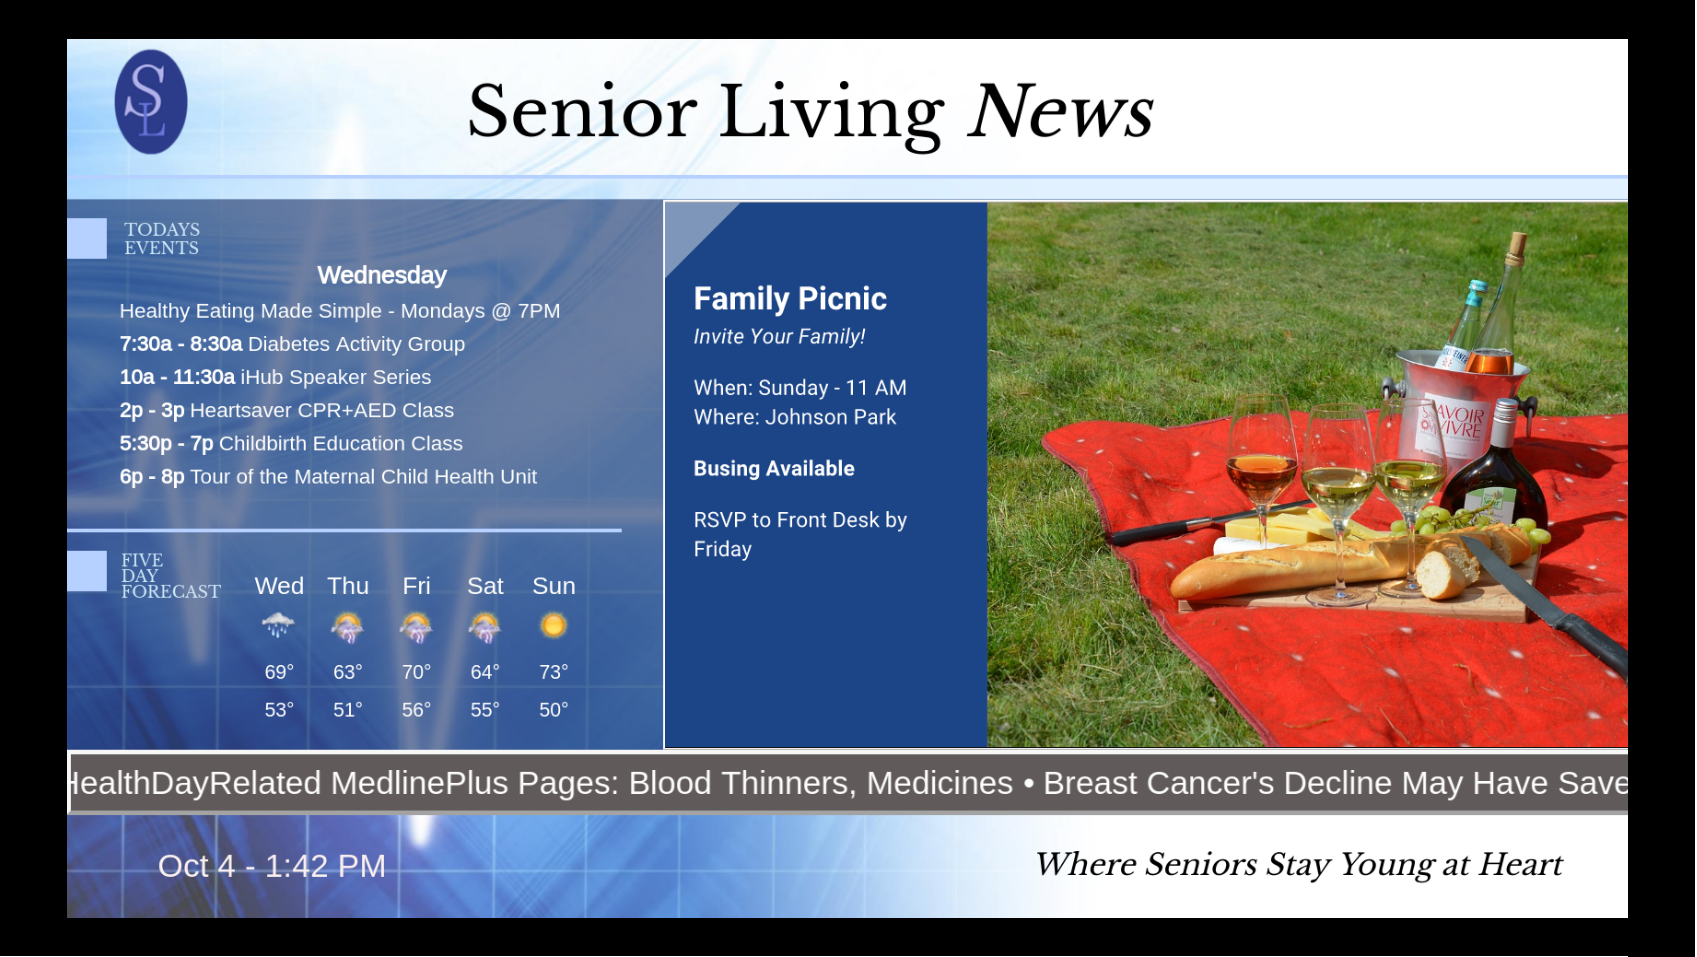 Digital Signage for Senior Living Centers